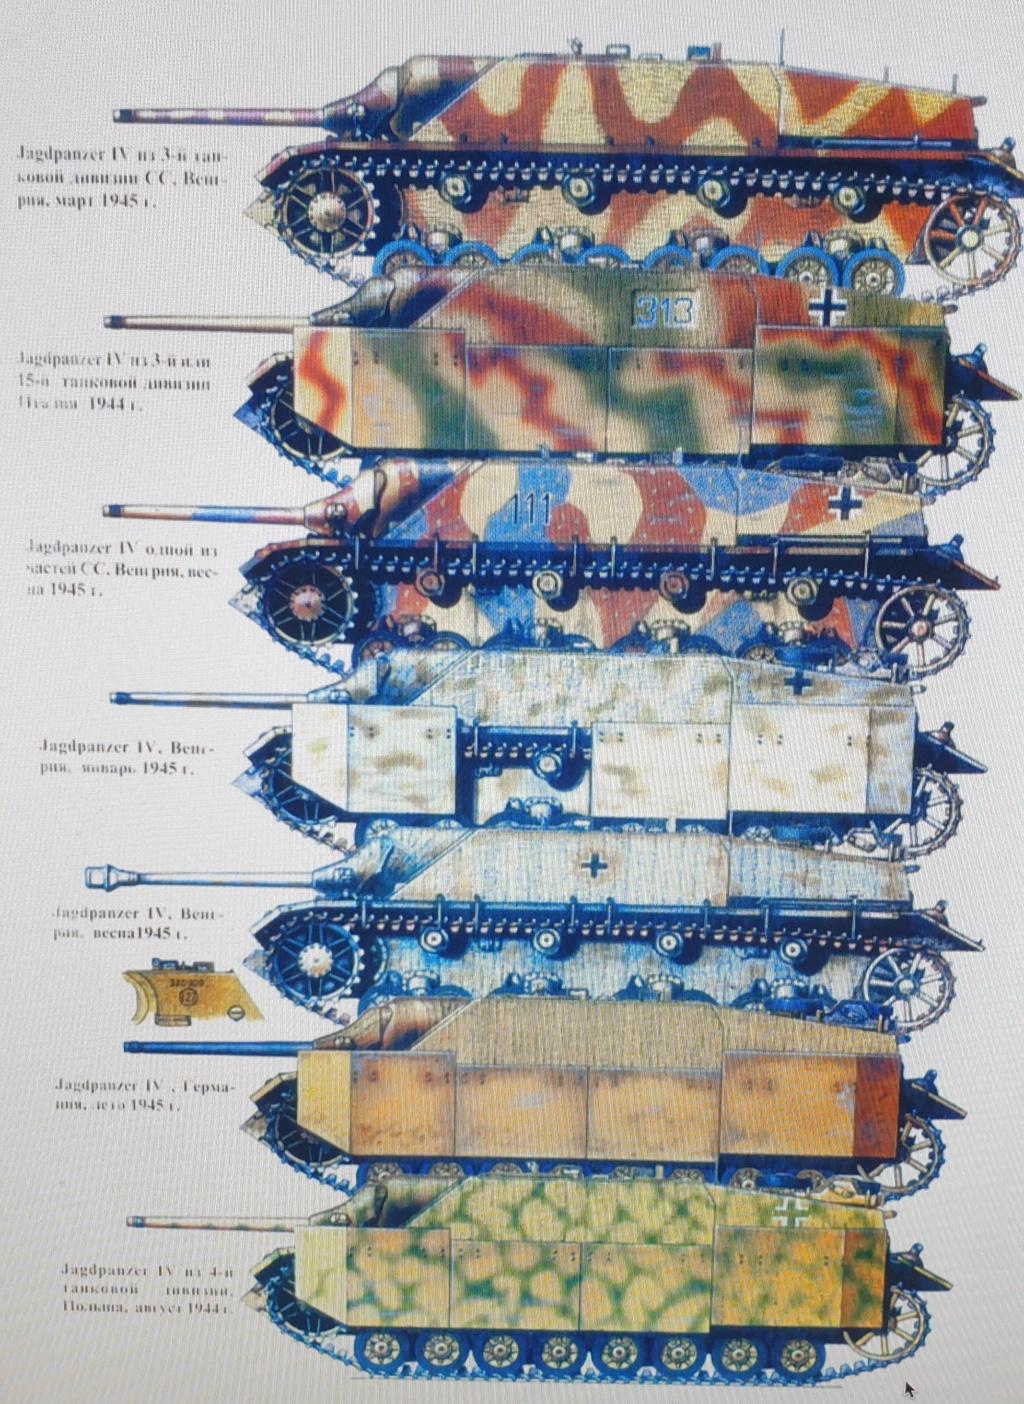 Guet-apens  Jadpanzer IV L48 / figurines DRAGON / décor perso  1/35  FINI  - Page 3 20201164